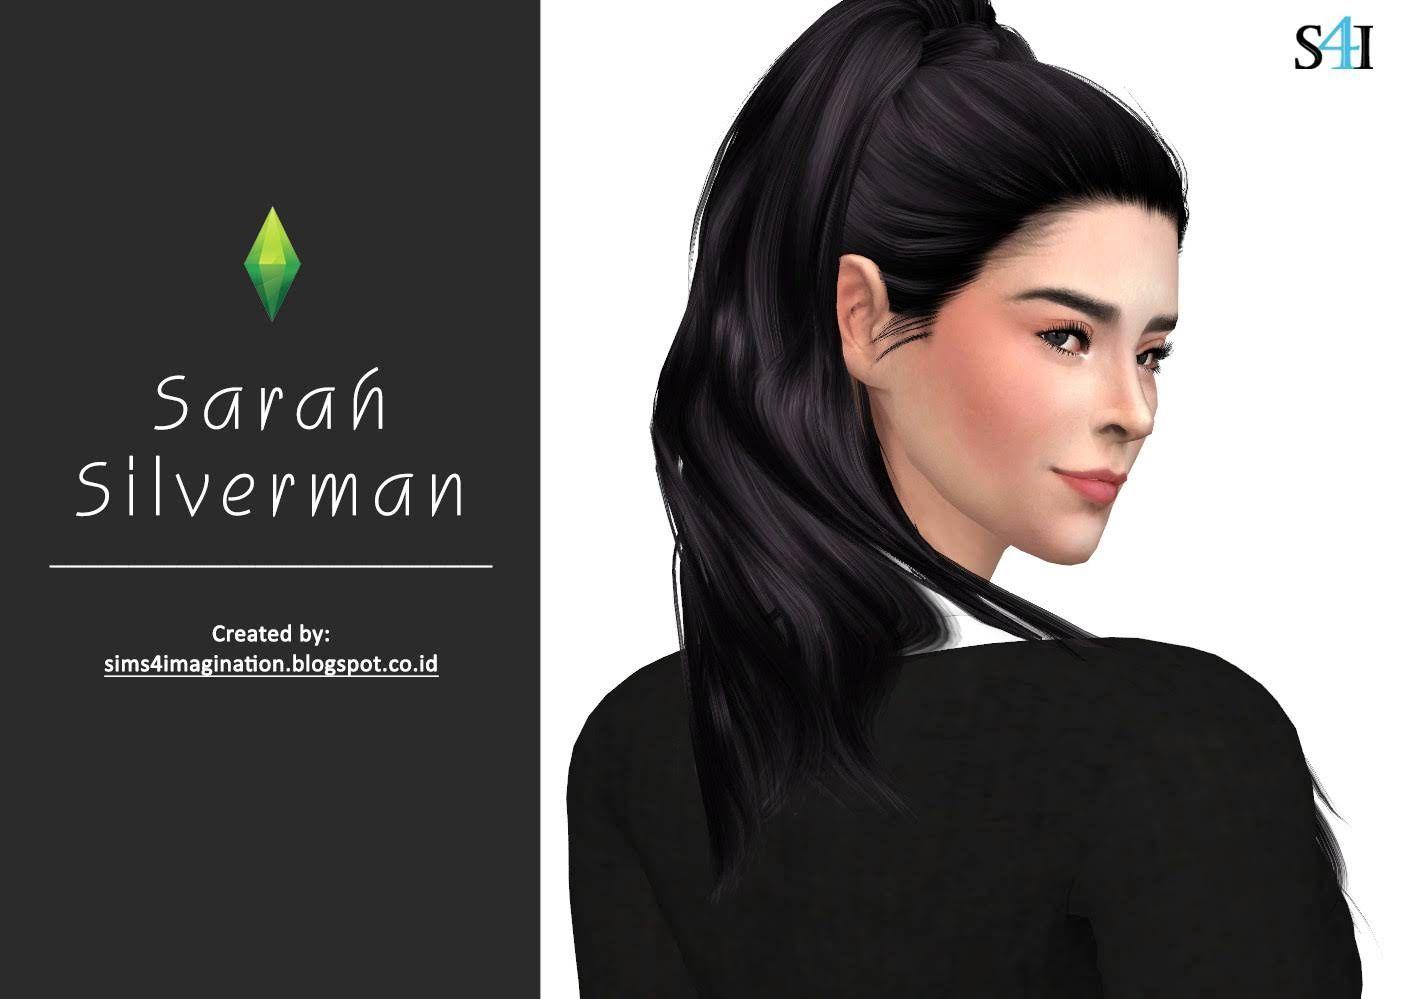 My Sims 4 CAS Sarah Silverman Sims 4 cas, My sims